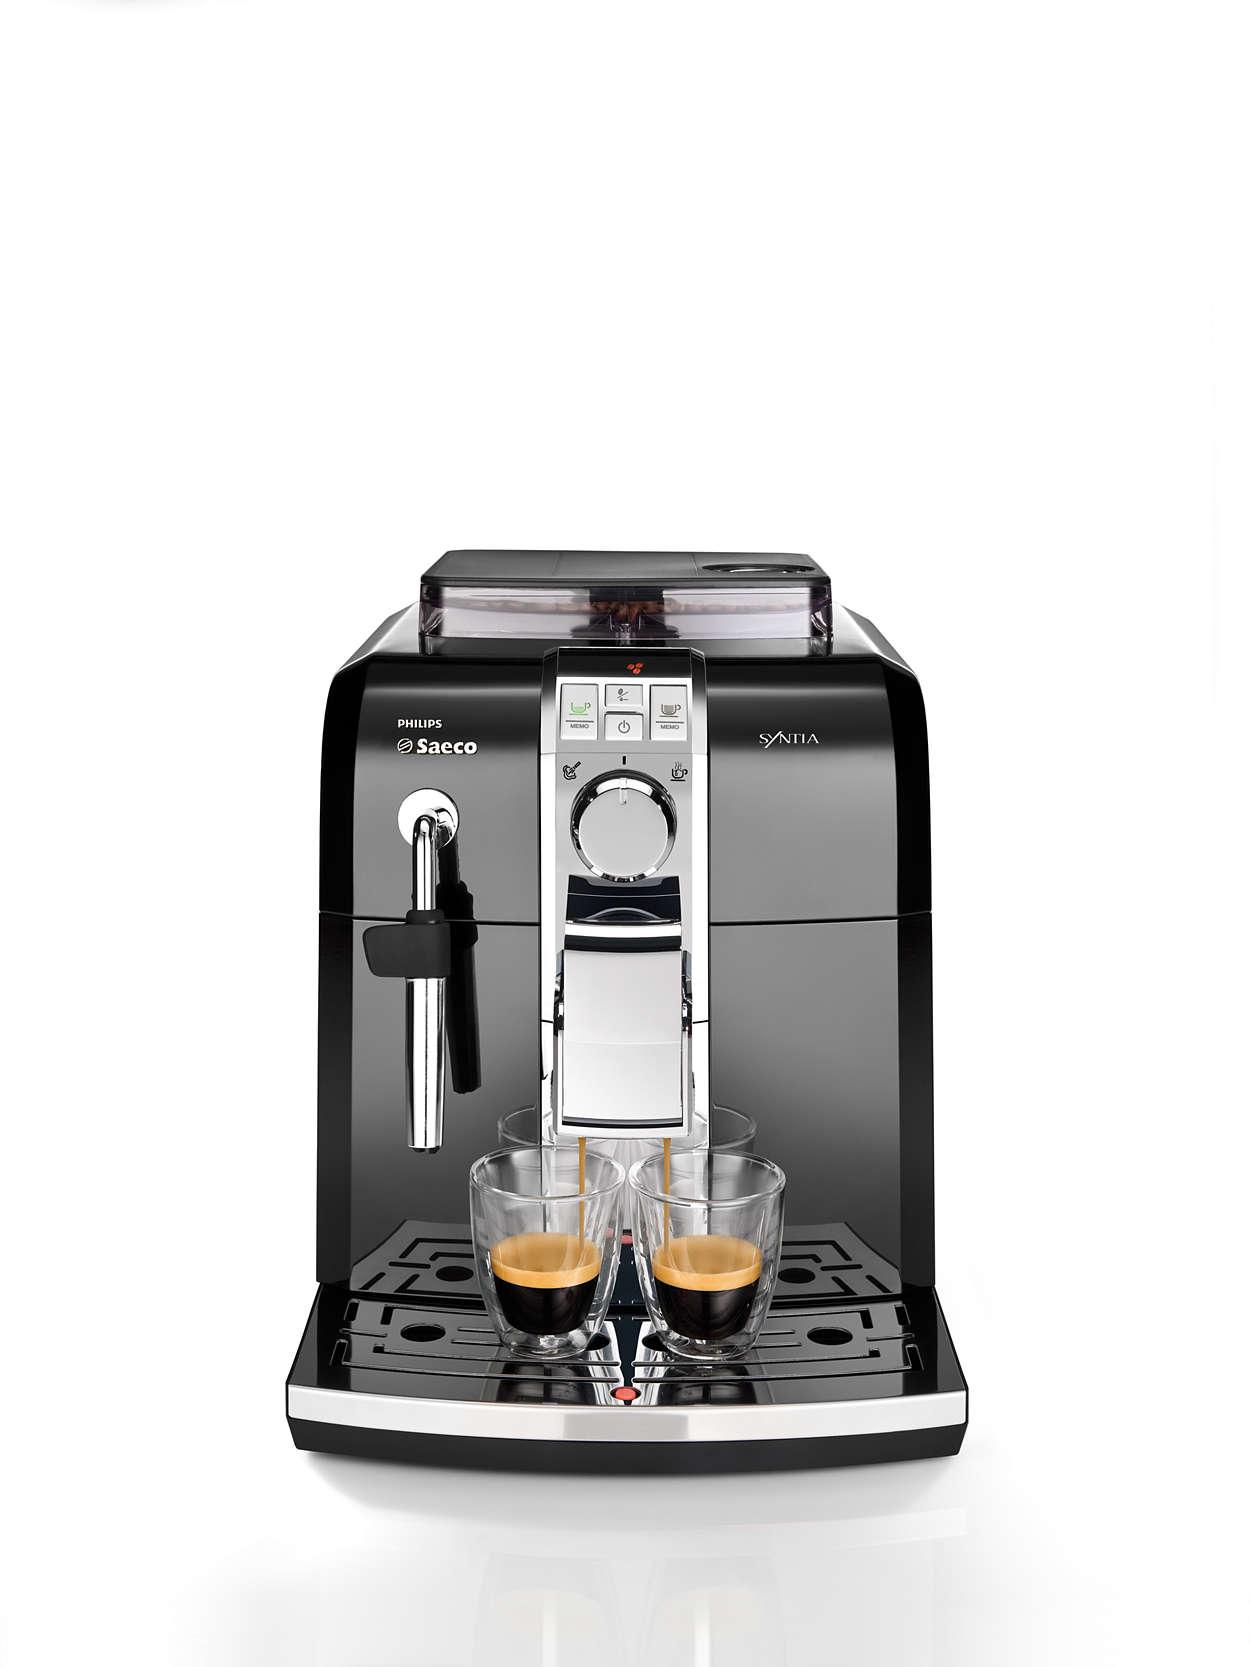 syntia kaffeevollautomat hd8833 11 saeco. Black Bedroom Furniture Sets. Home Design Ideas